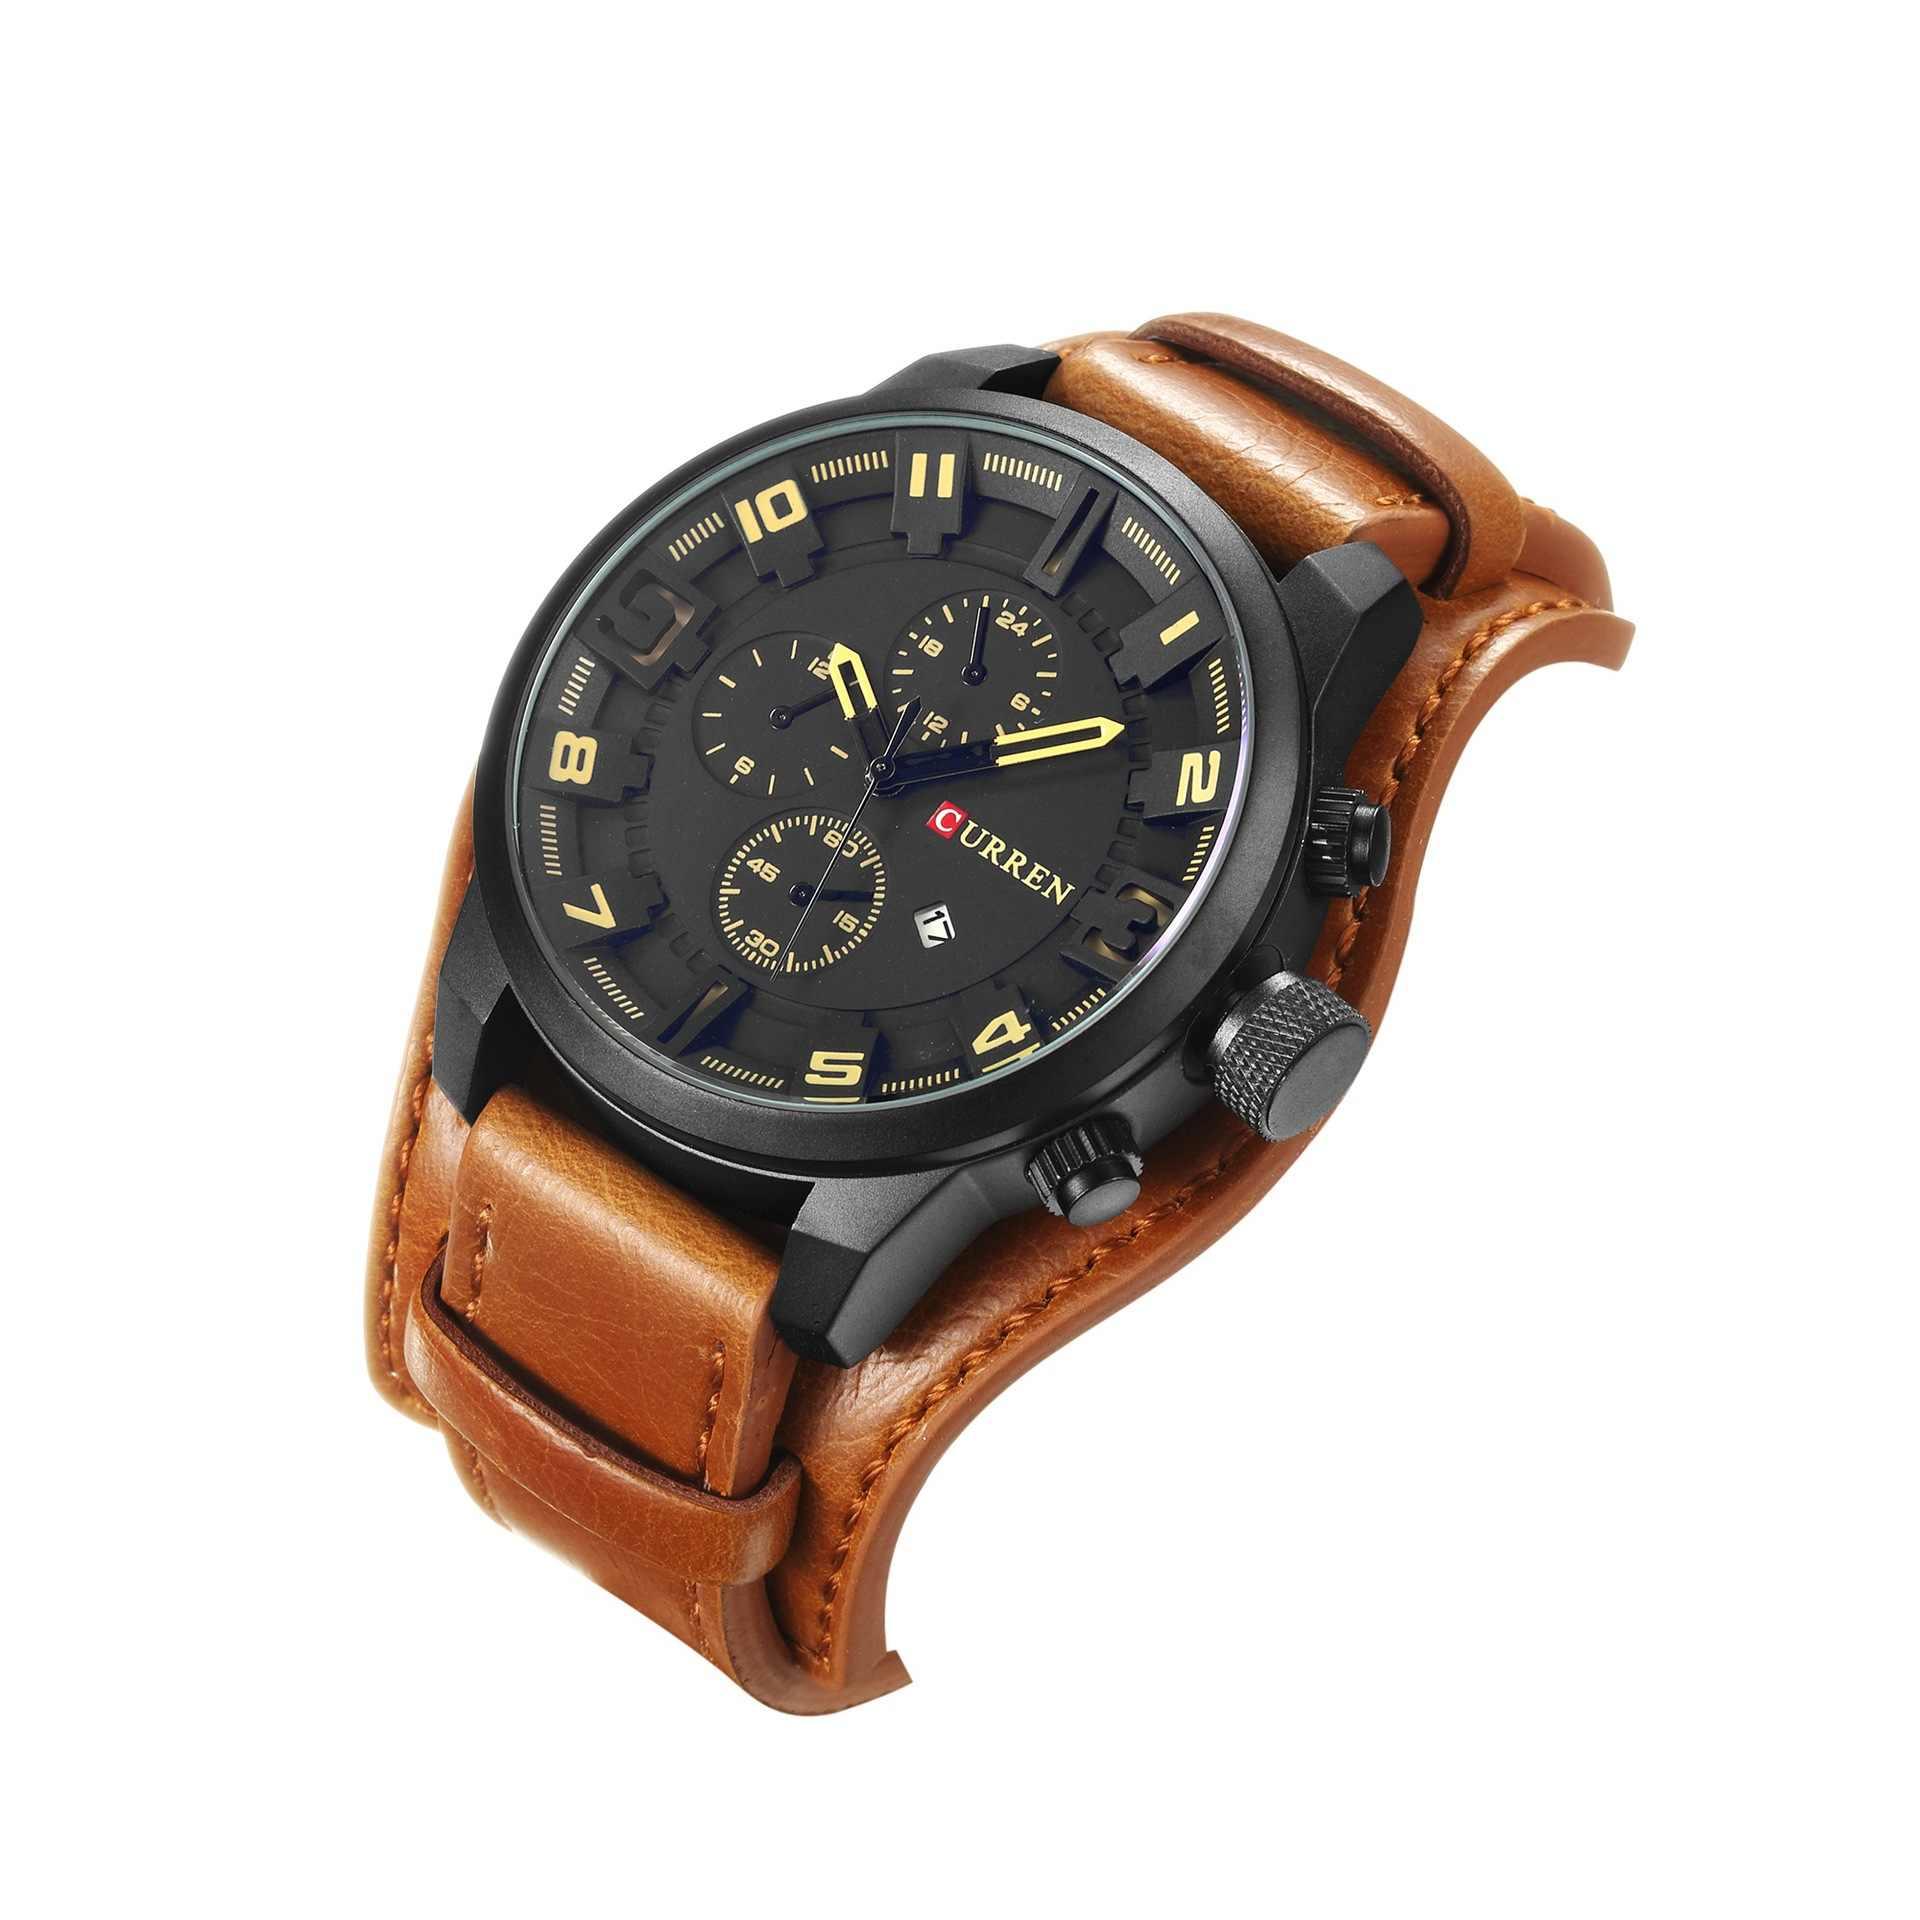 Curren luxury luxury ยี่ห้อ Quartz ผู้ชายนาฬิกาปฏิทินแฟชั่นกีฬาหนังนาฬิกาข้อมือ relogio masculino